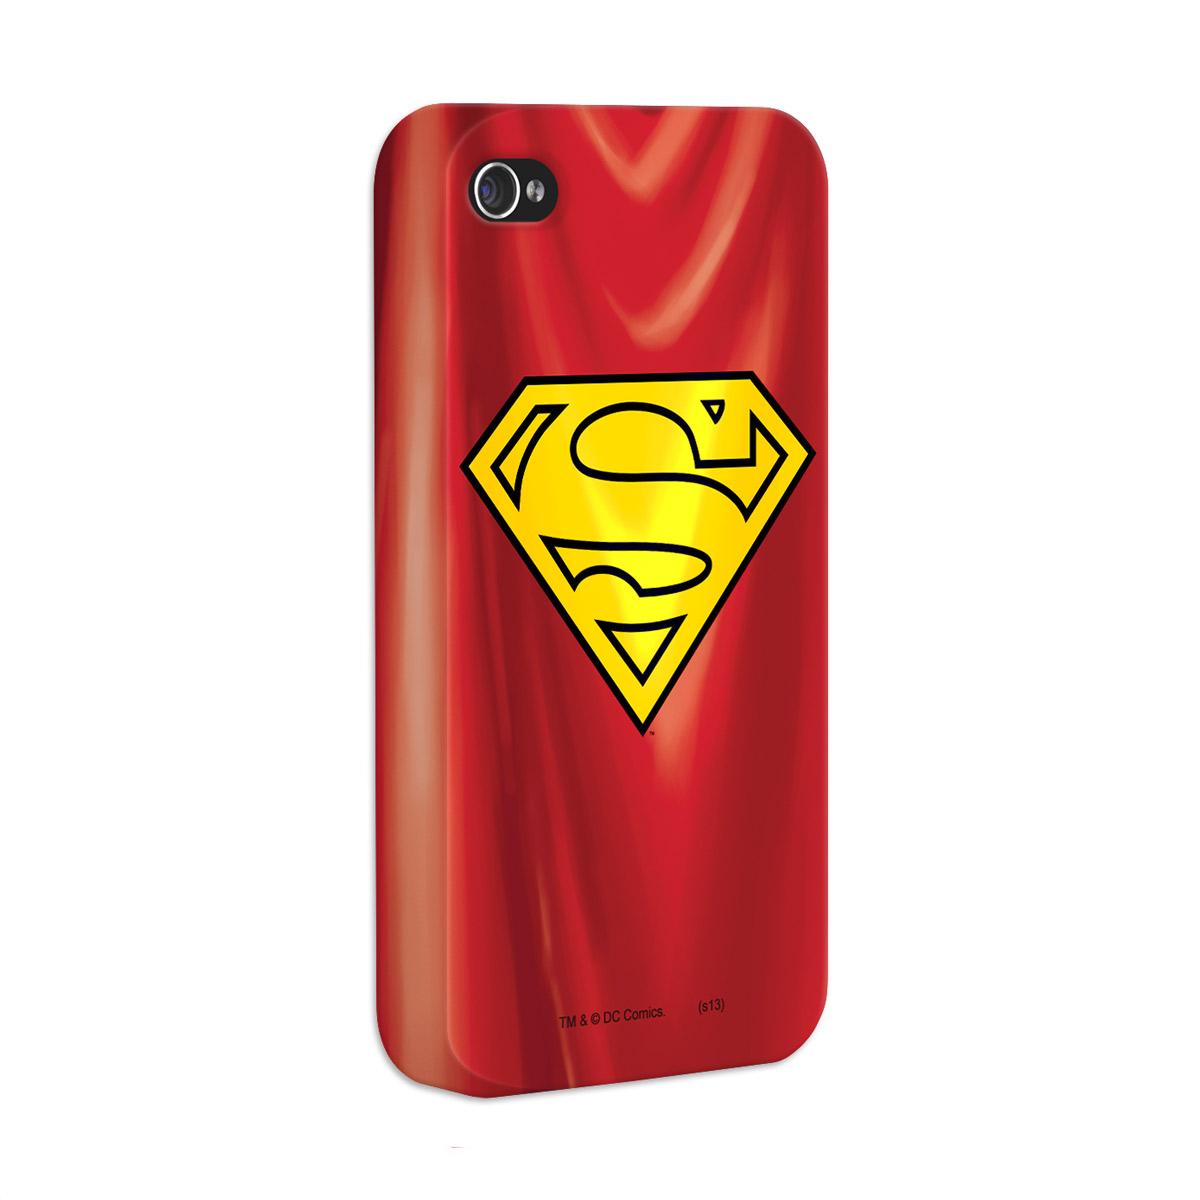 Kit Com 3 Capas de iPhone 4/4S Superman - The Man Of Steel